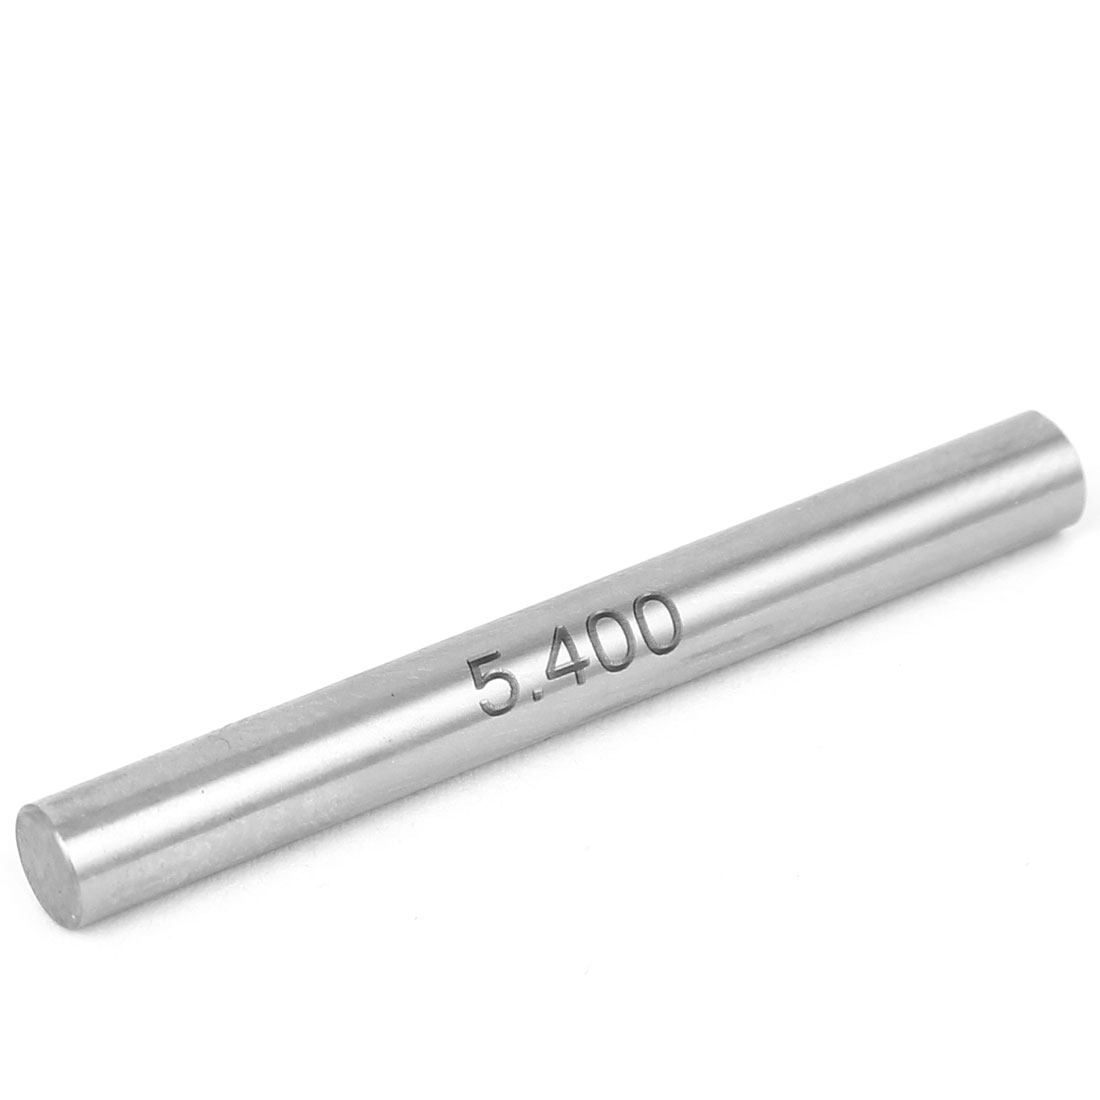 5.40mm Dia +/-0.001mm Tolerance GCR15 Cylinder PCB Checking Plug Pin Gage Gauge